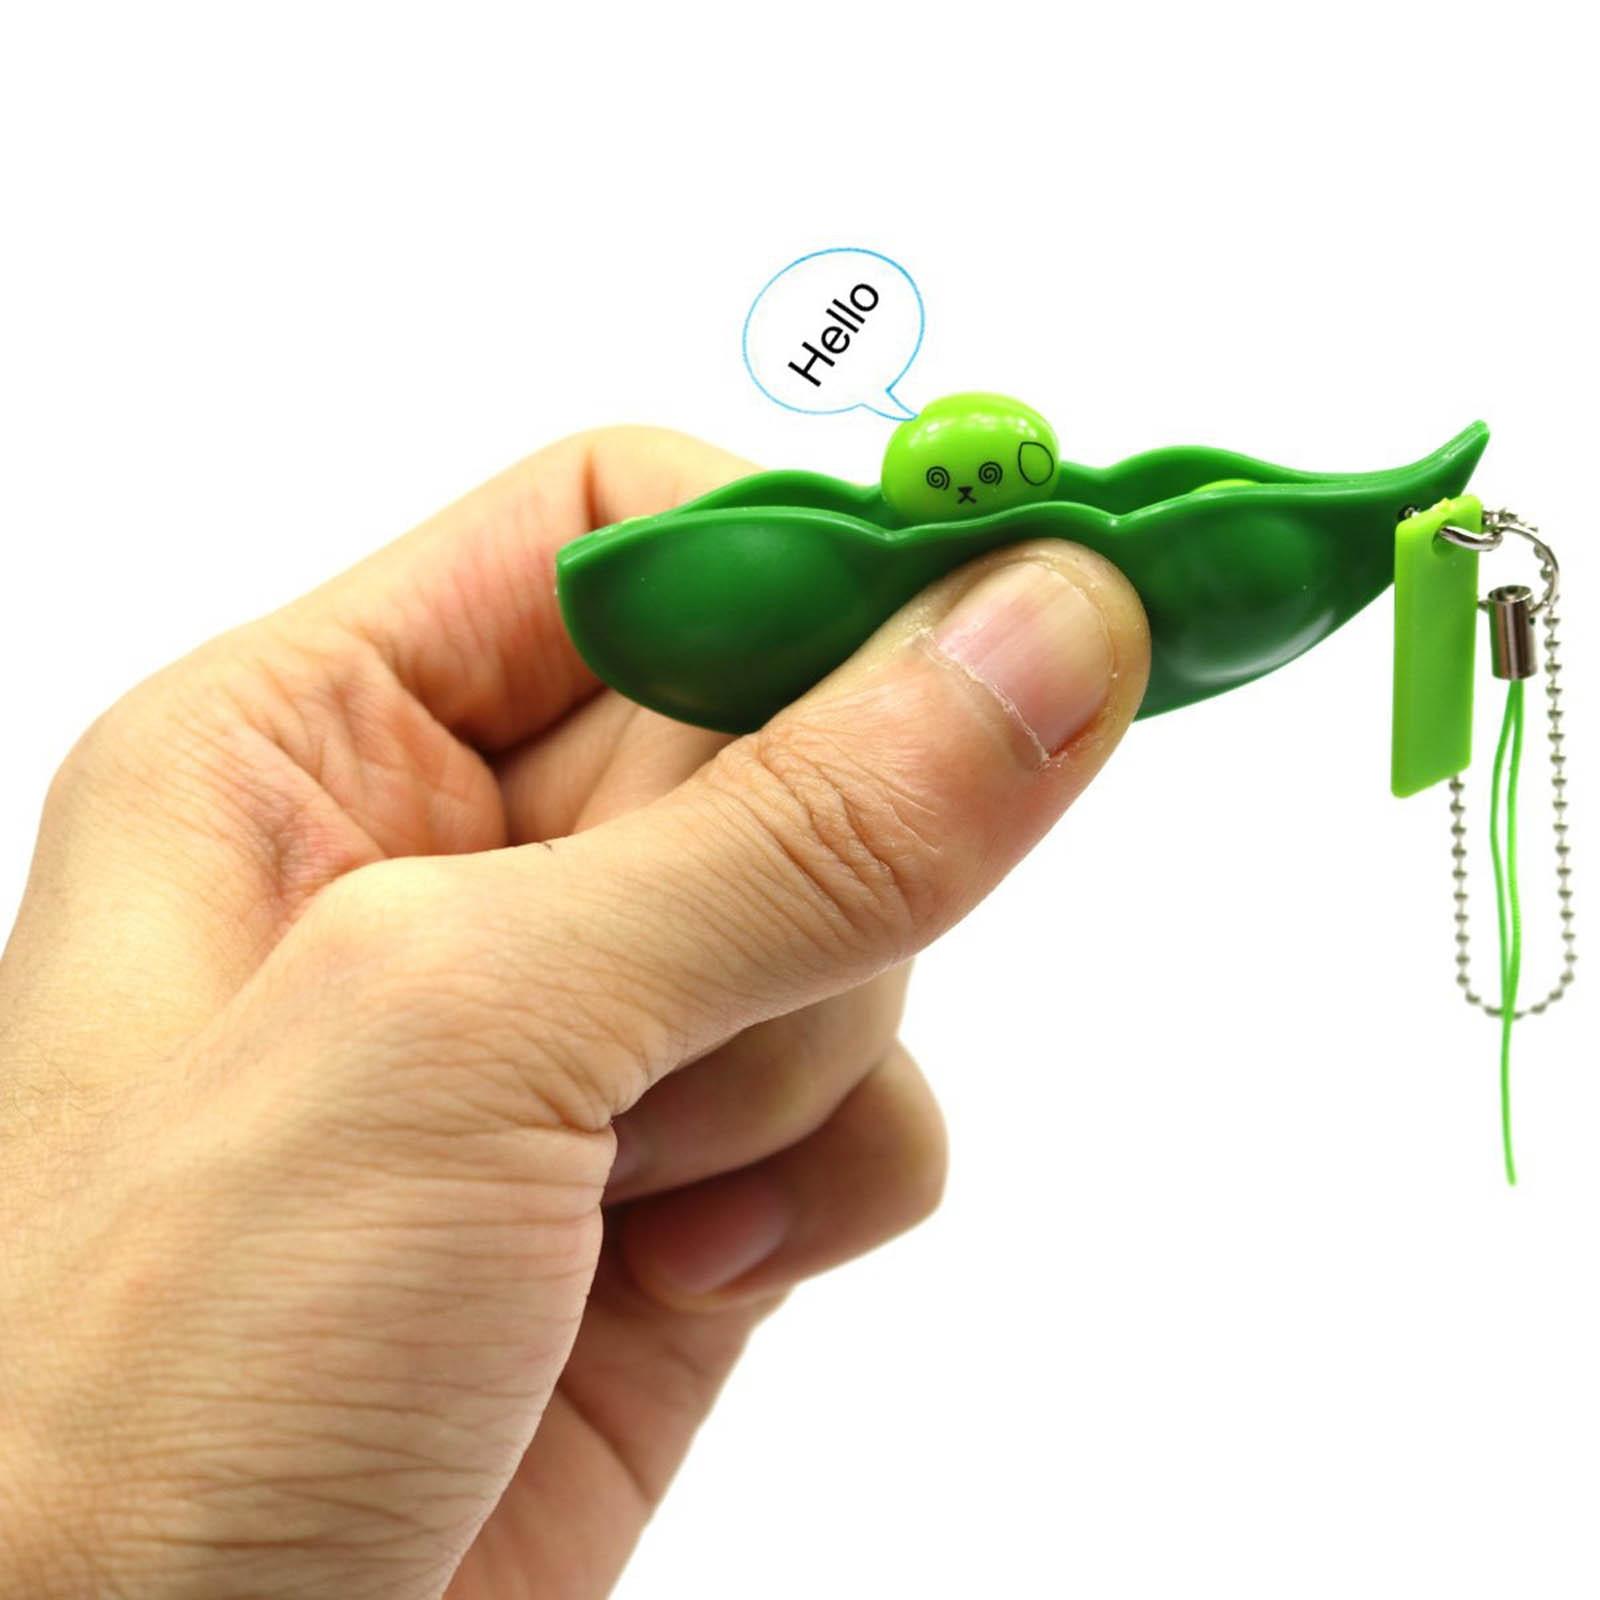 Anti-Stress Toys Keychain Edamame-Toy Peas-Beans Rubber Decompression Pop-It-Fidget Squeeze img4